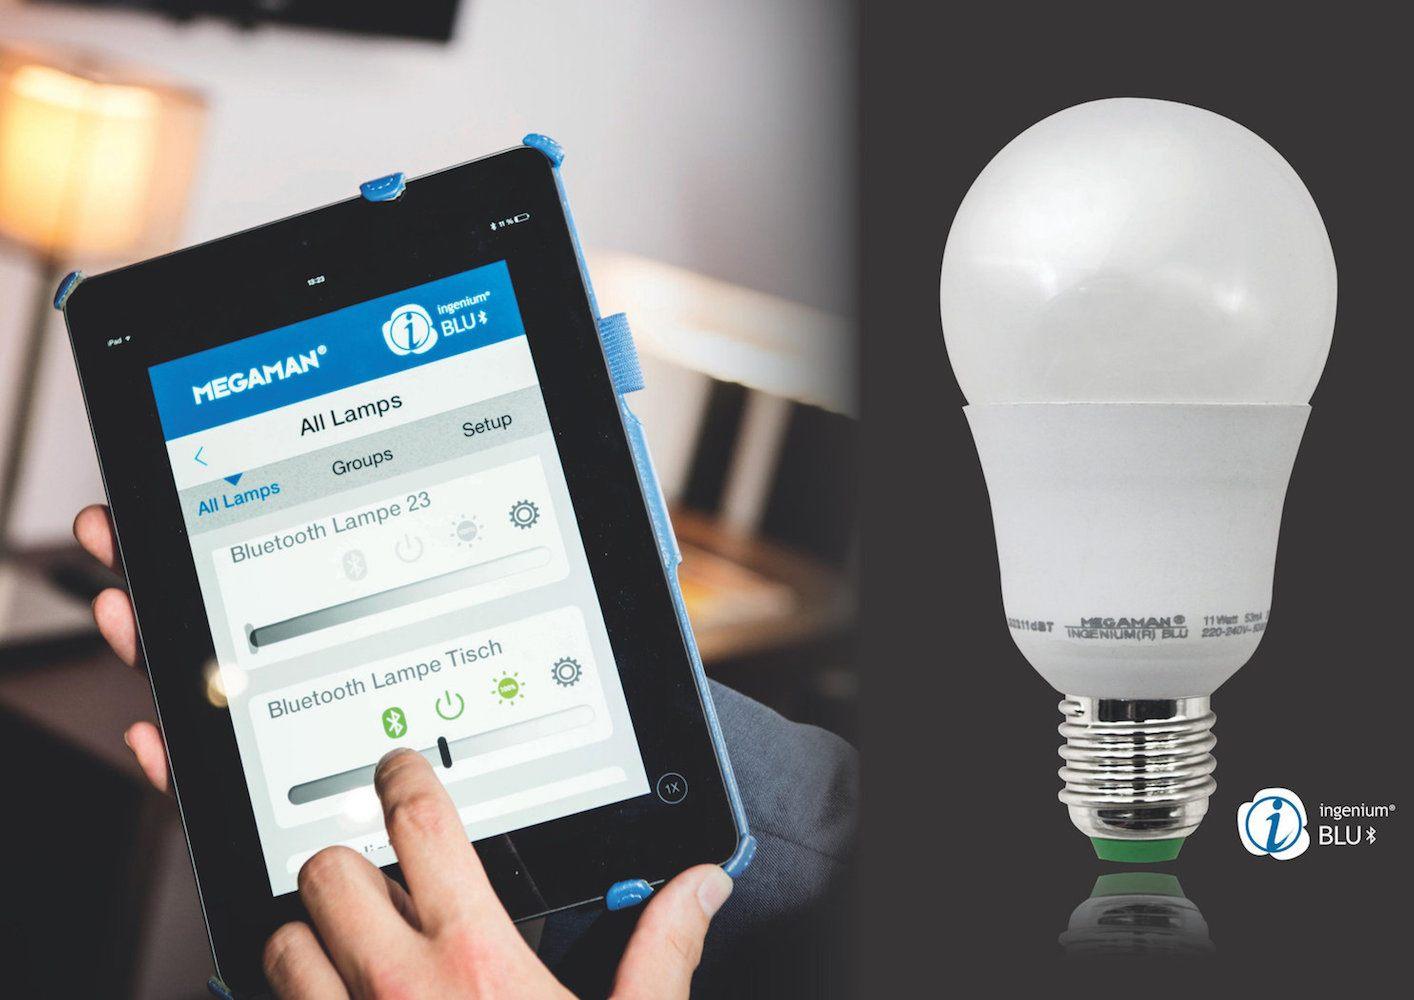 smartlighting landsccape smart conference logo light lighting expo